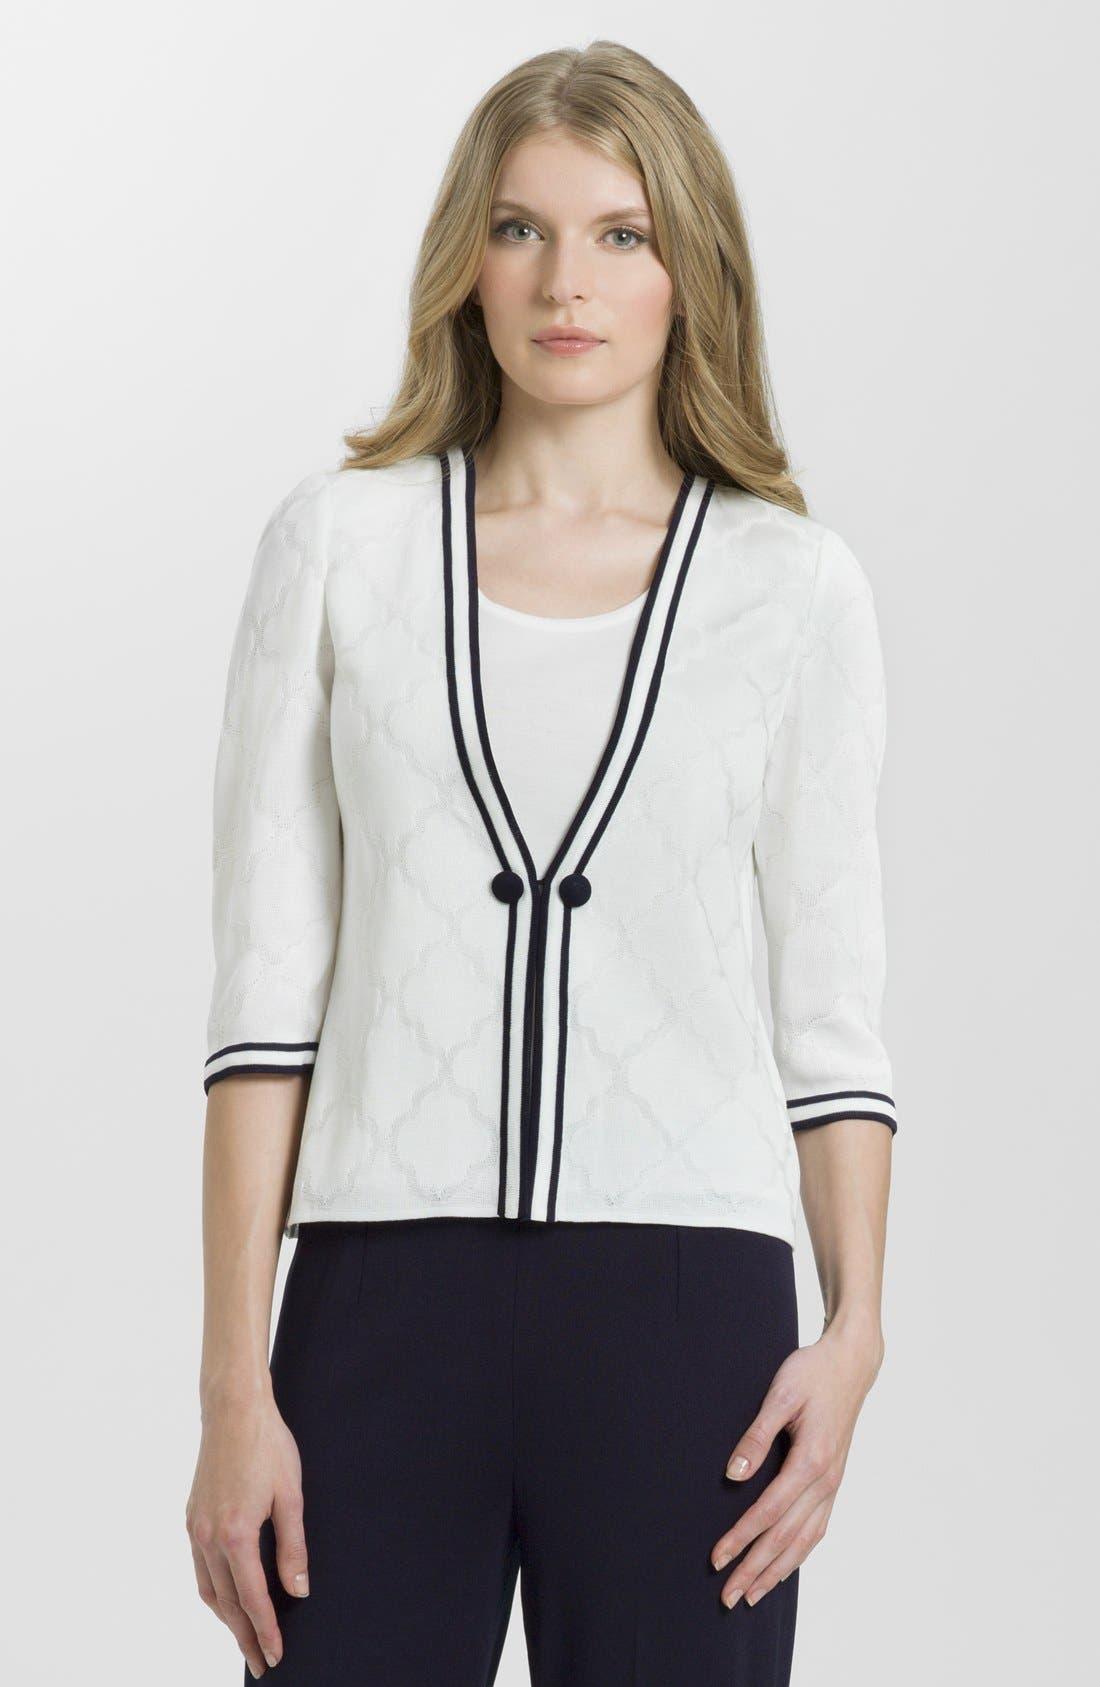 Alternate Image 1 Selected - Ming Wang V-Neck Jacquard Jacket